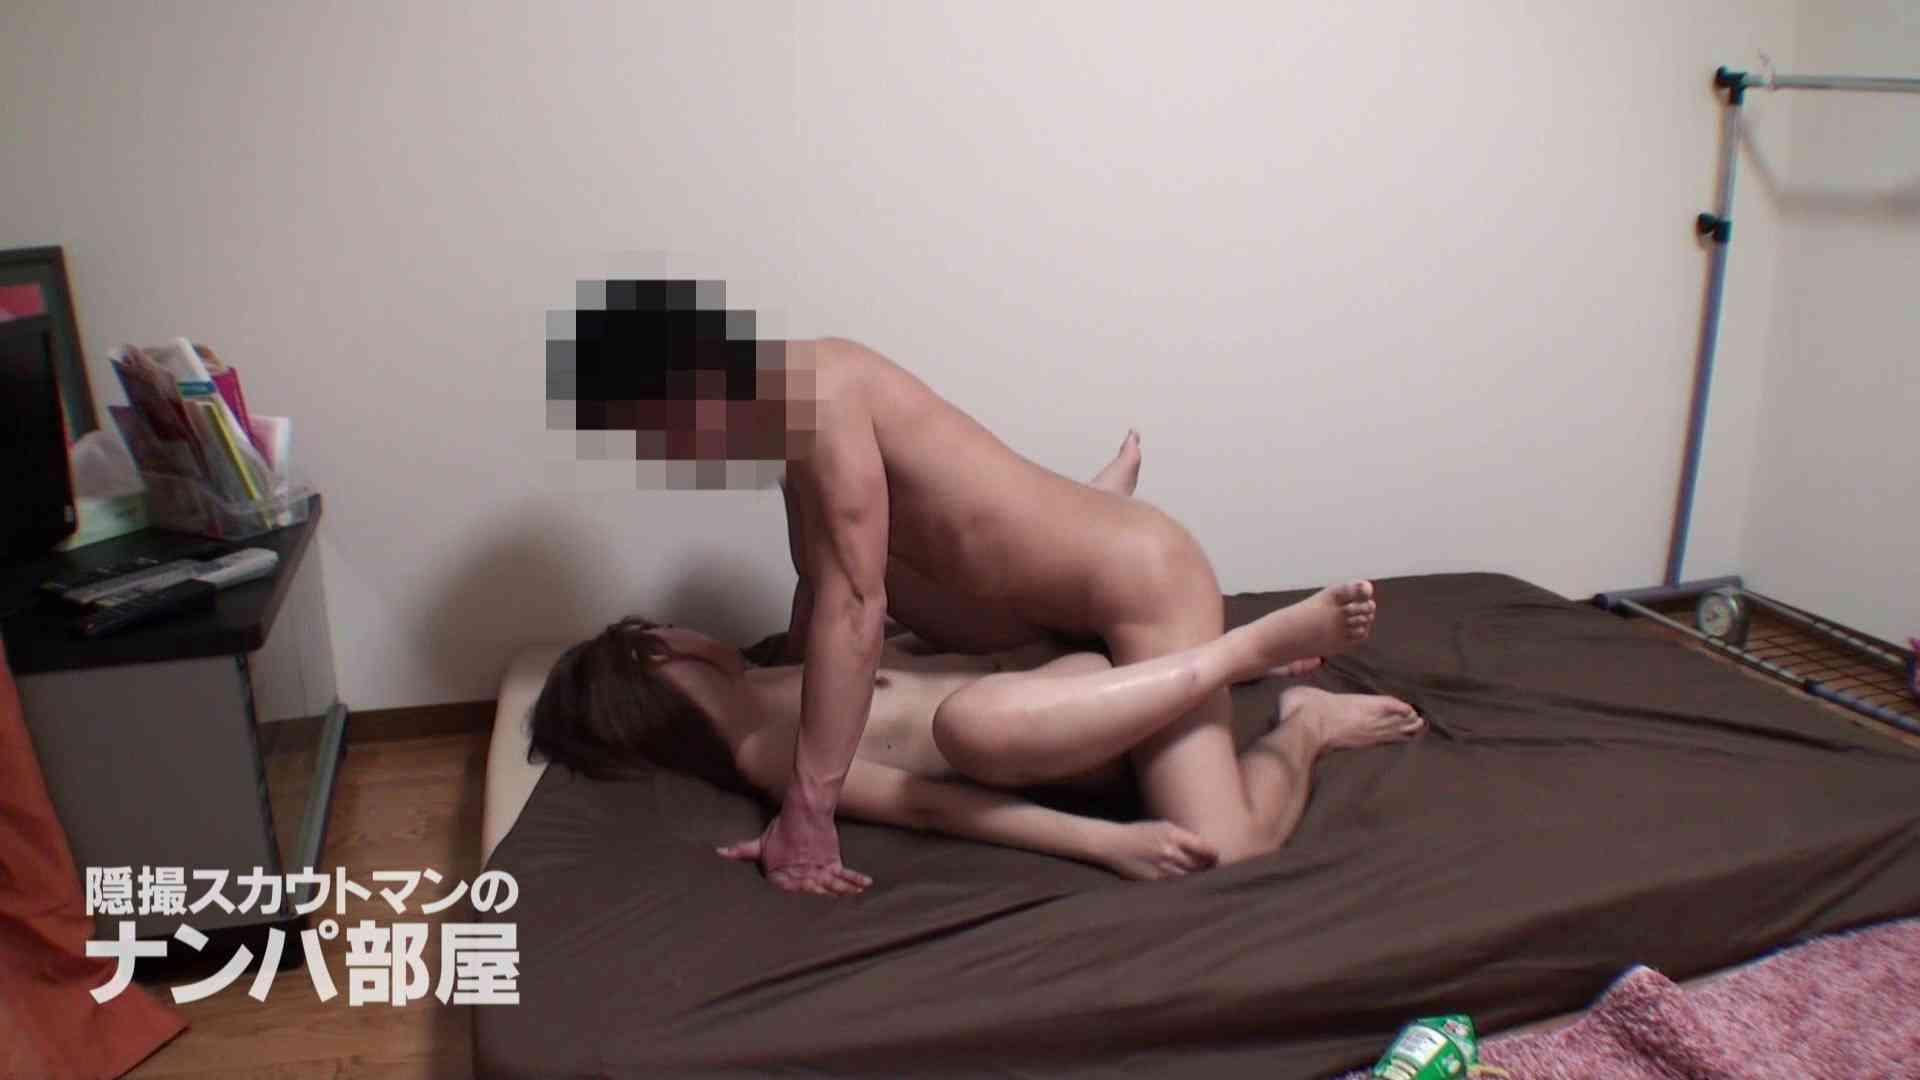 vol.8 kana セックスする女性達  57画像 52